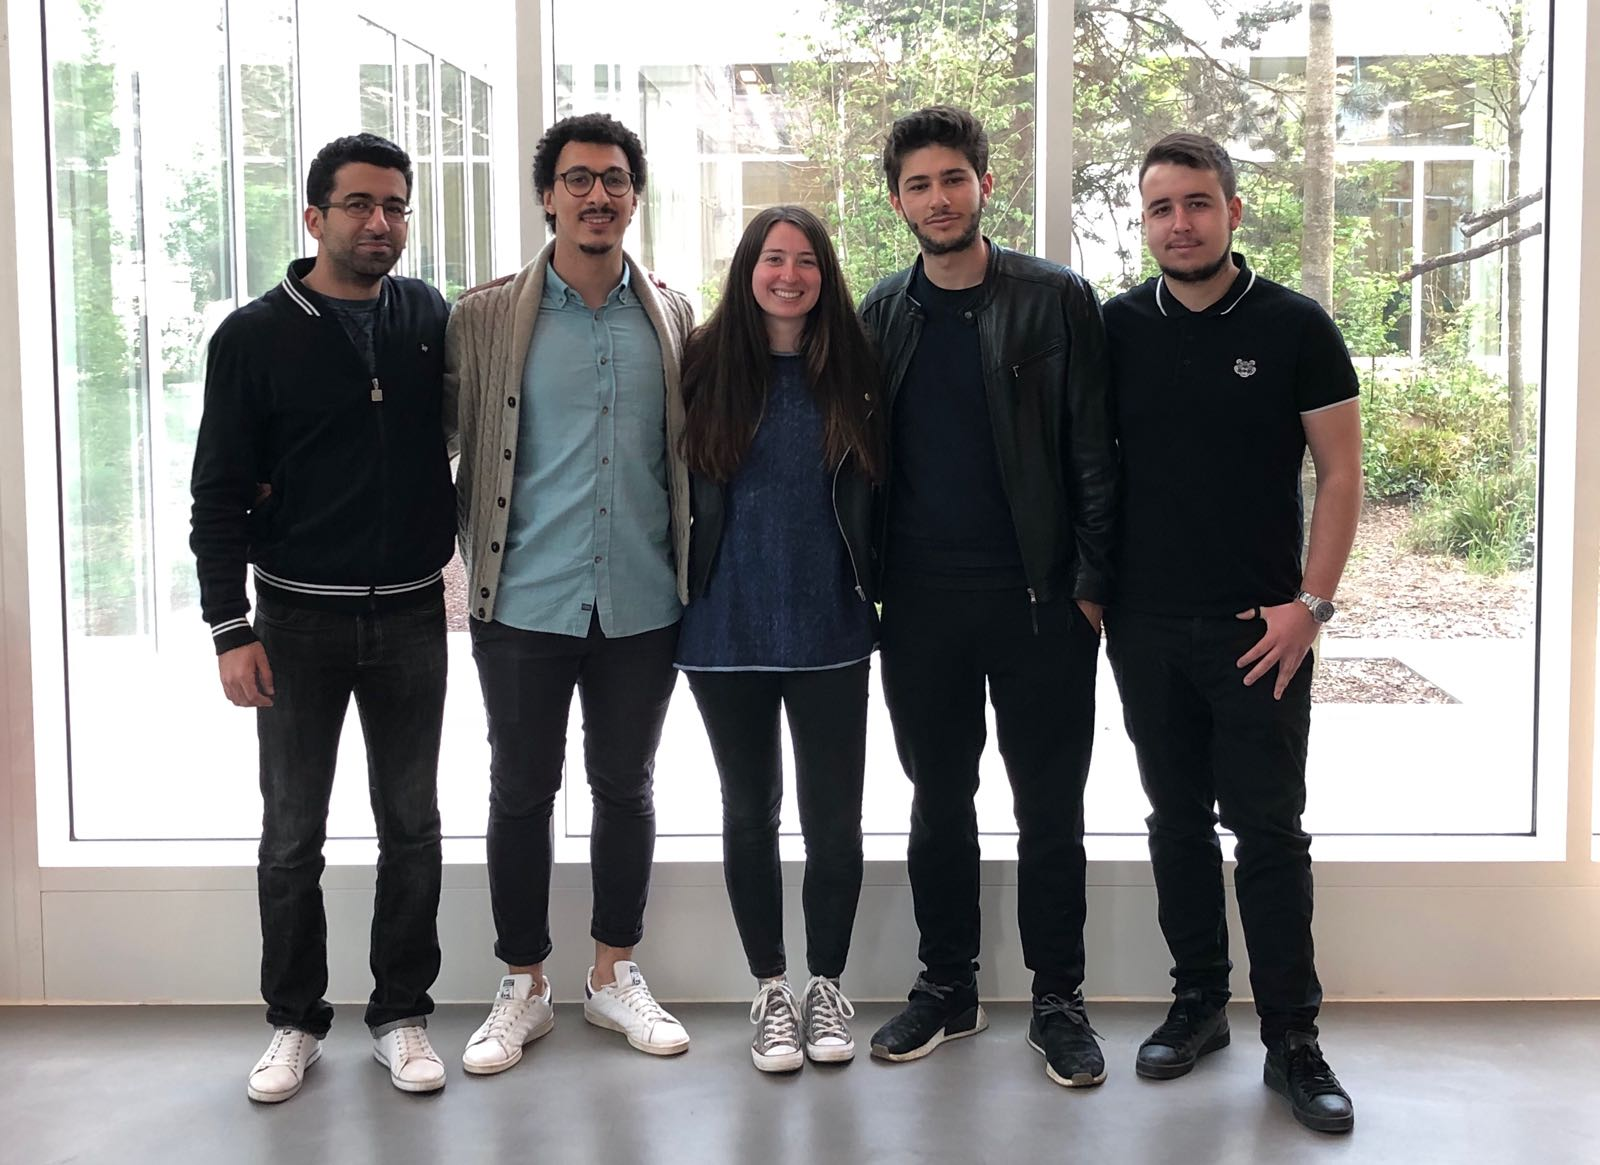 Alexandre Abadie, Aziz Ben M'Barek, Raphael Cohen, Victoire De Brosses et Amine Gagou